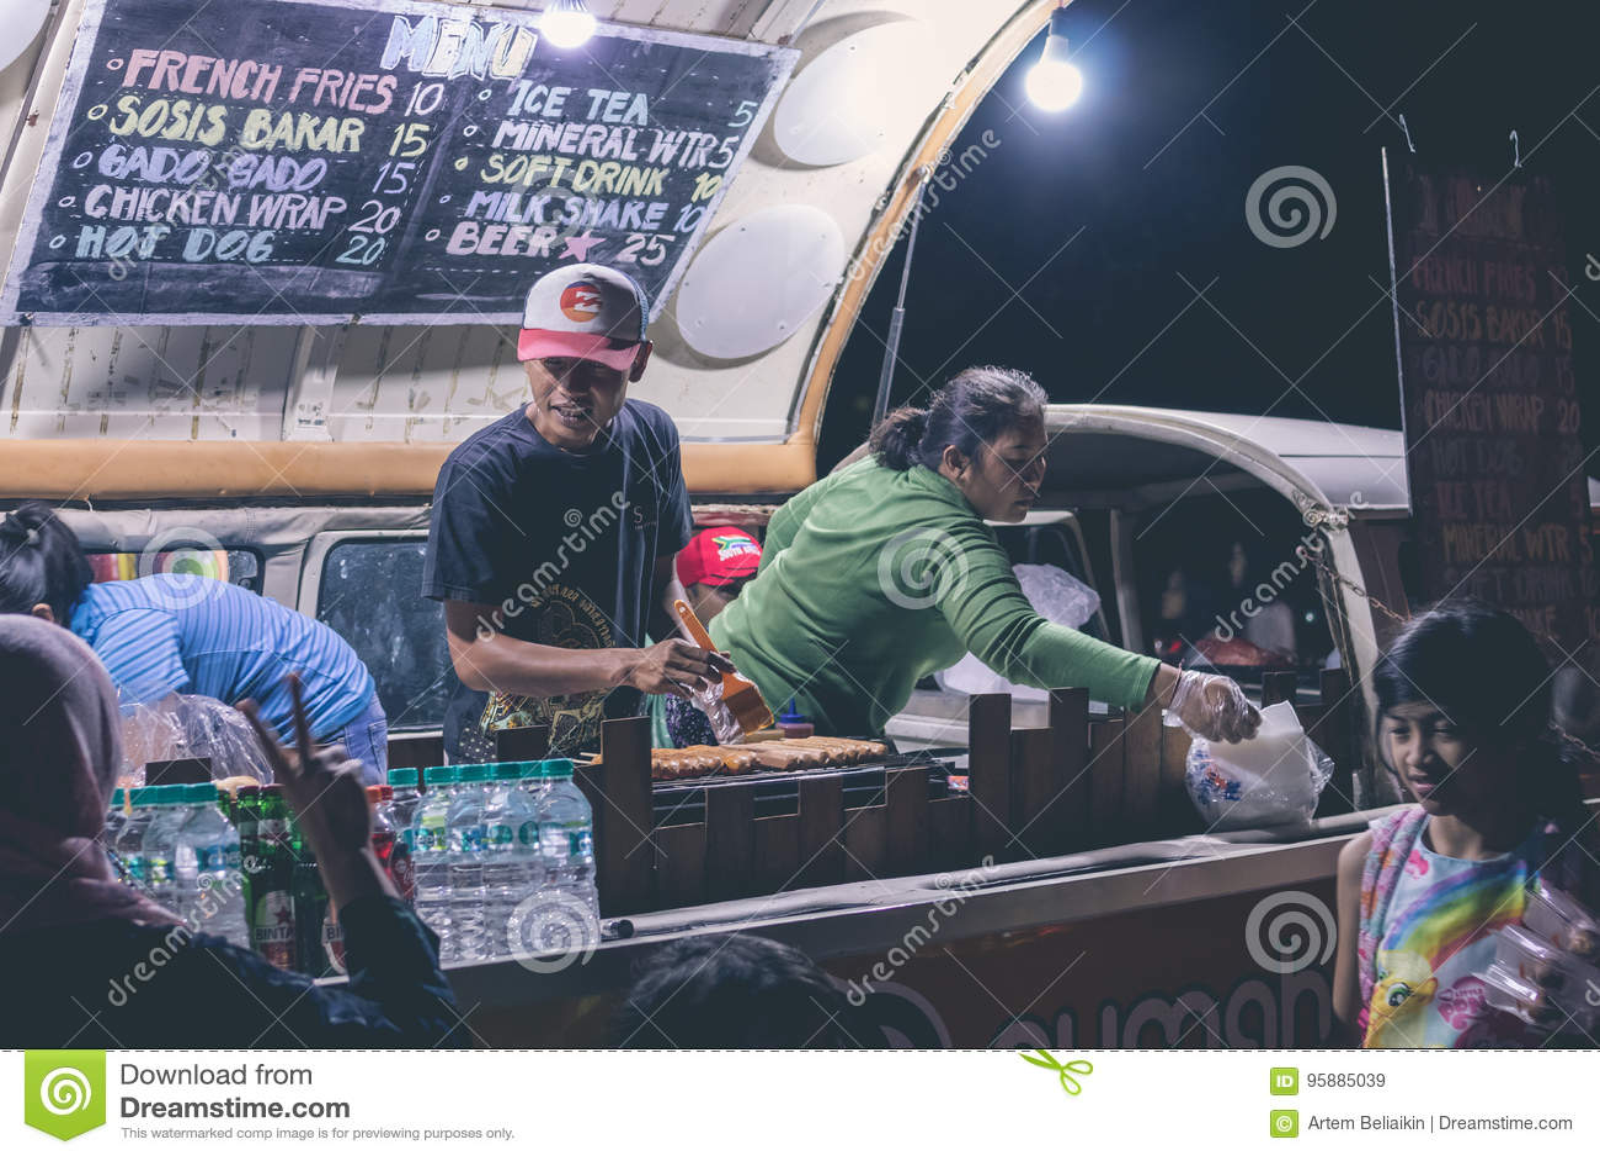 BALI, INDONESIA - JULY 8, 2017: Indonesian street food cafe, fast food on festival on Bali island.